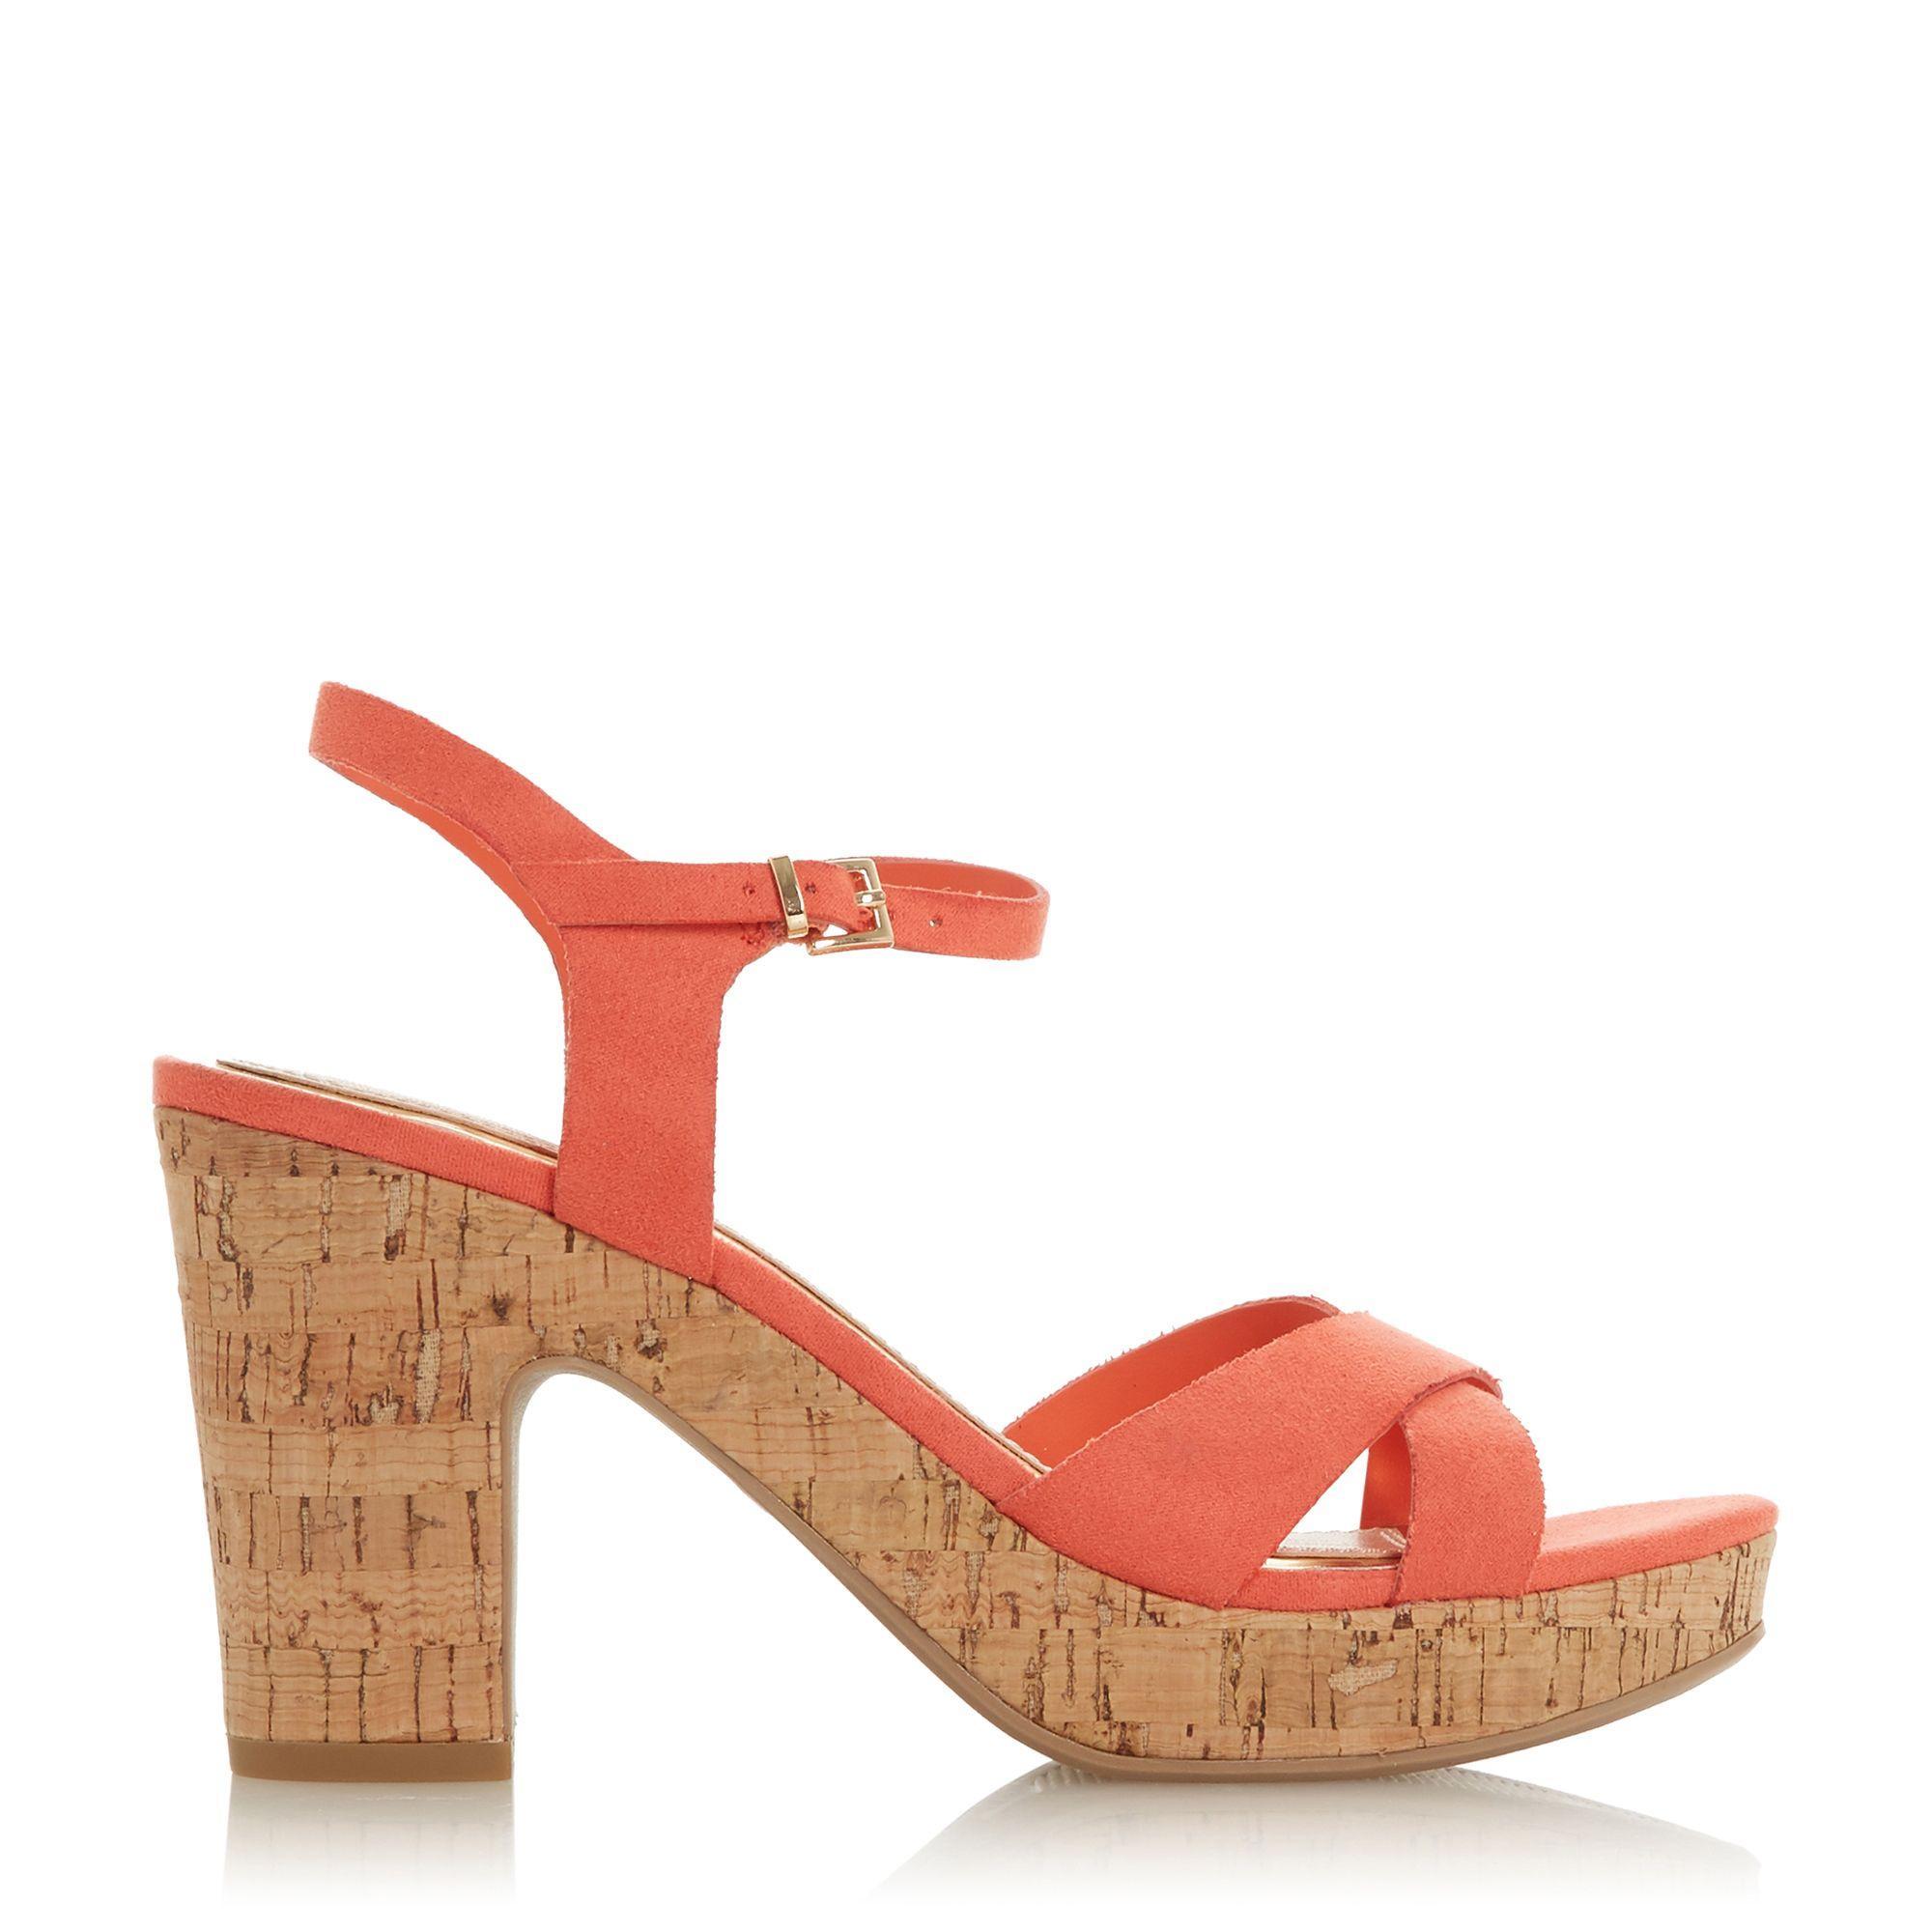 4262463e643 Dune Dark Peach 'joany' High Block Heel Ankle Strap Sandals - Lyst